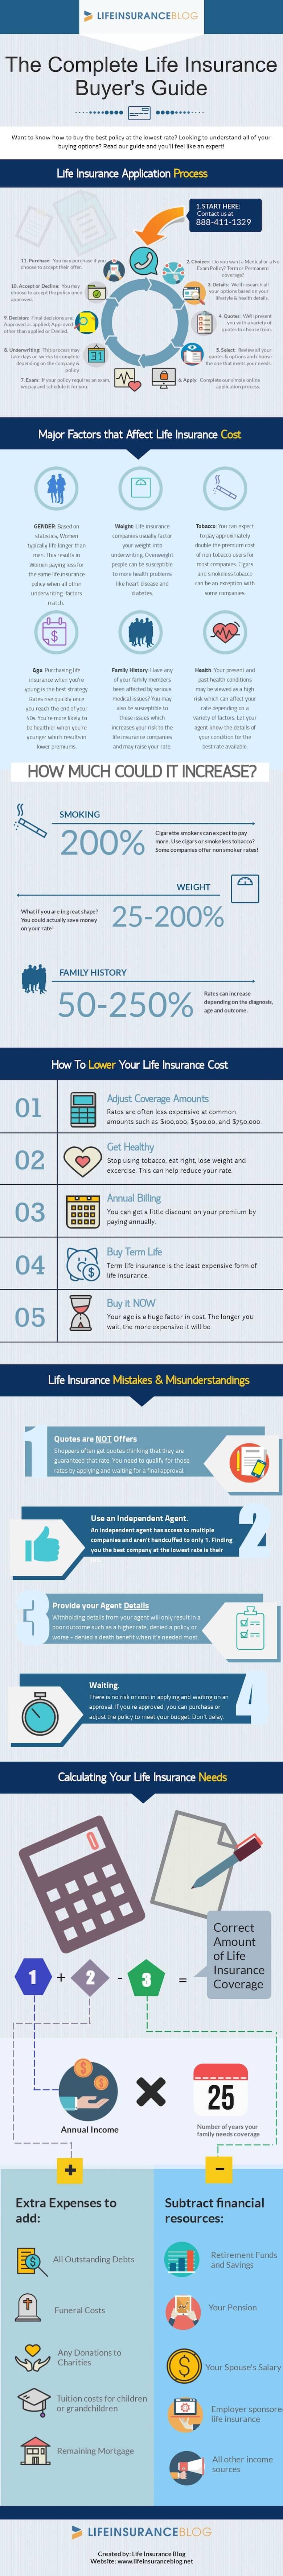 life insurance shopping advice